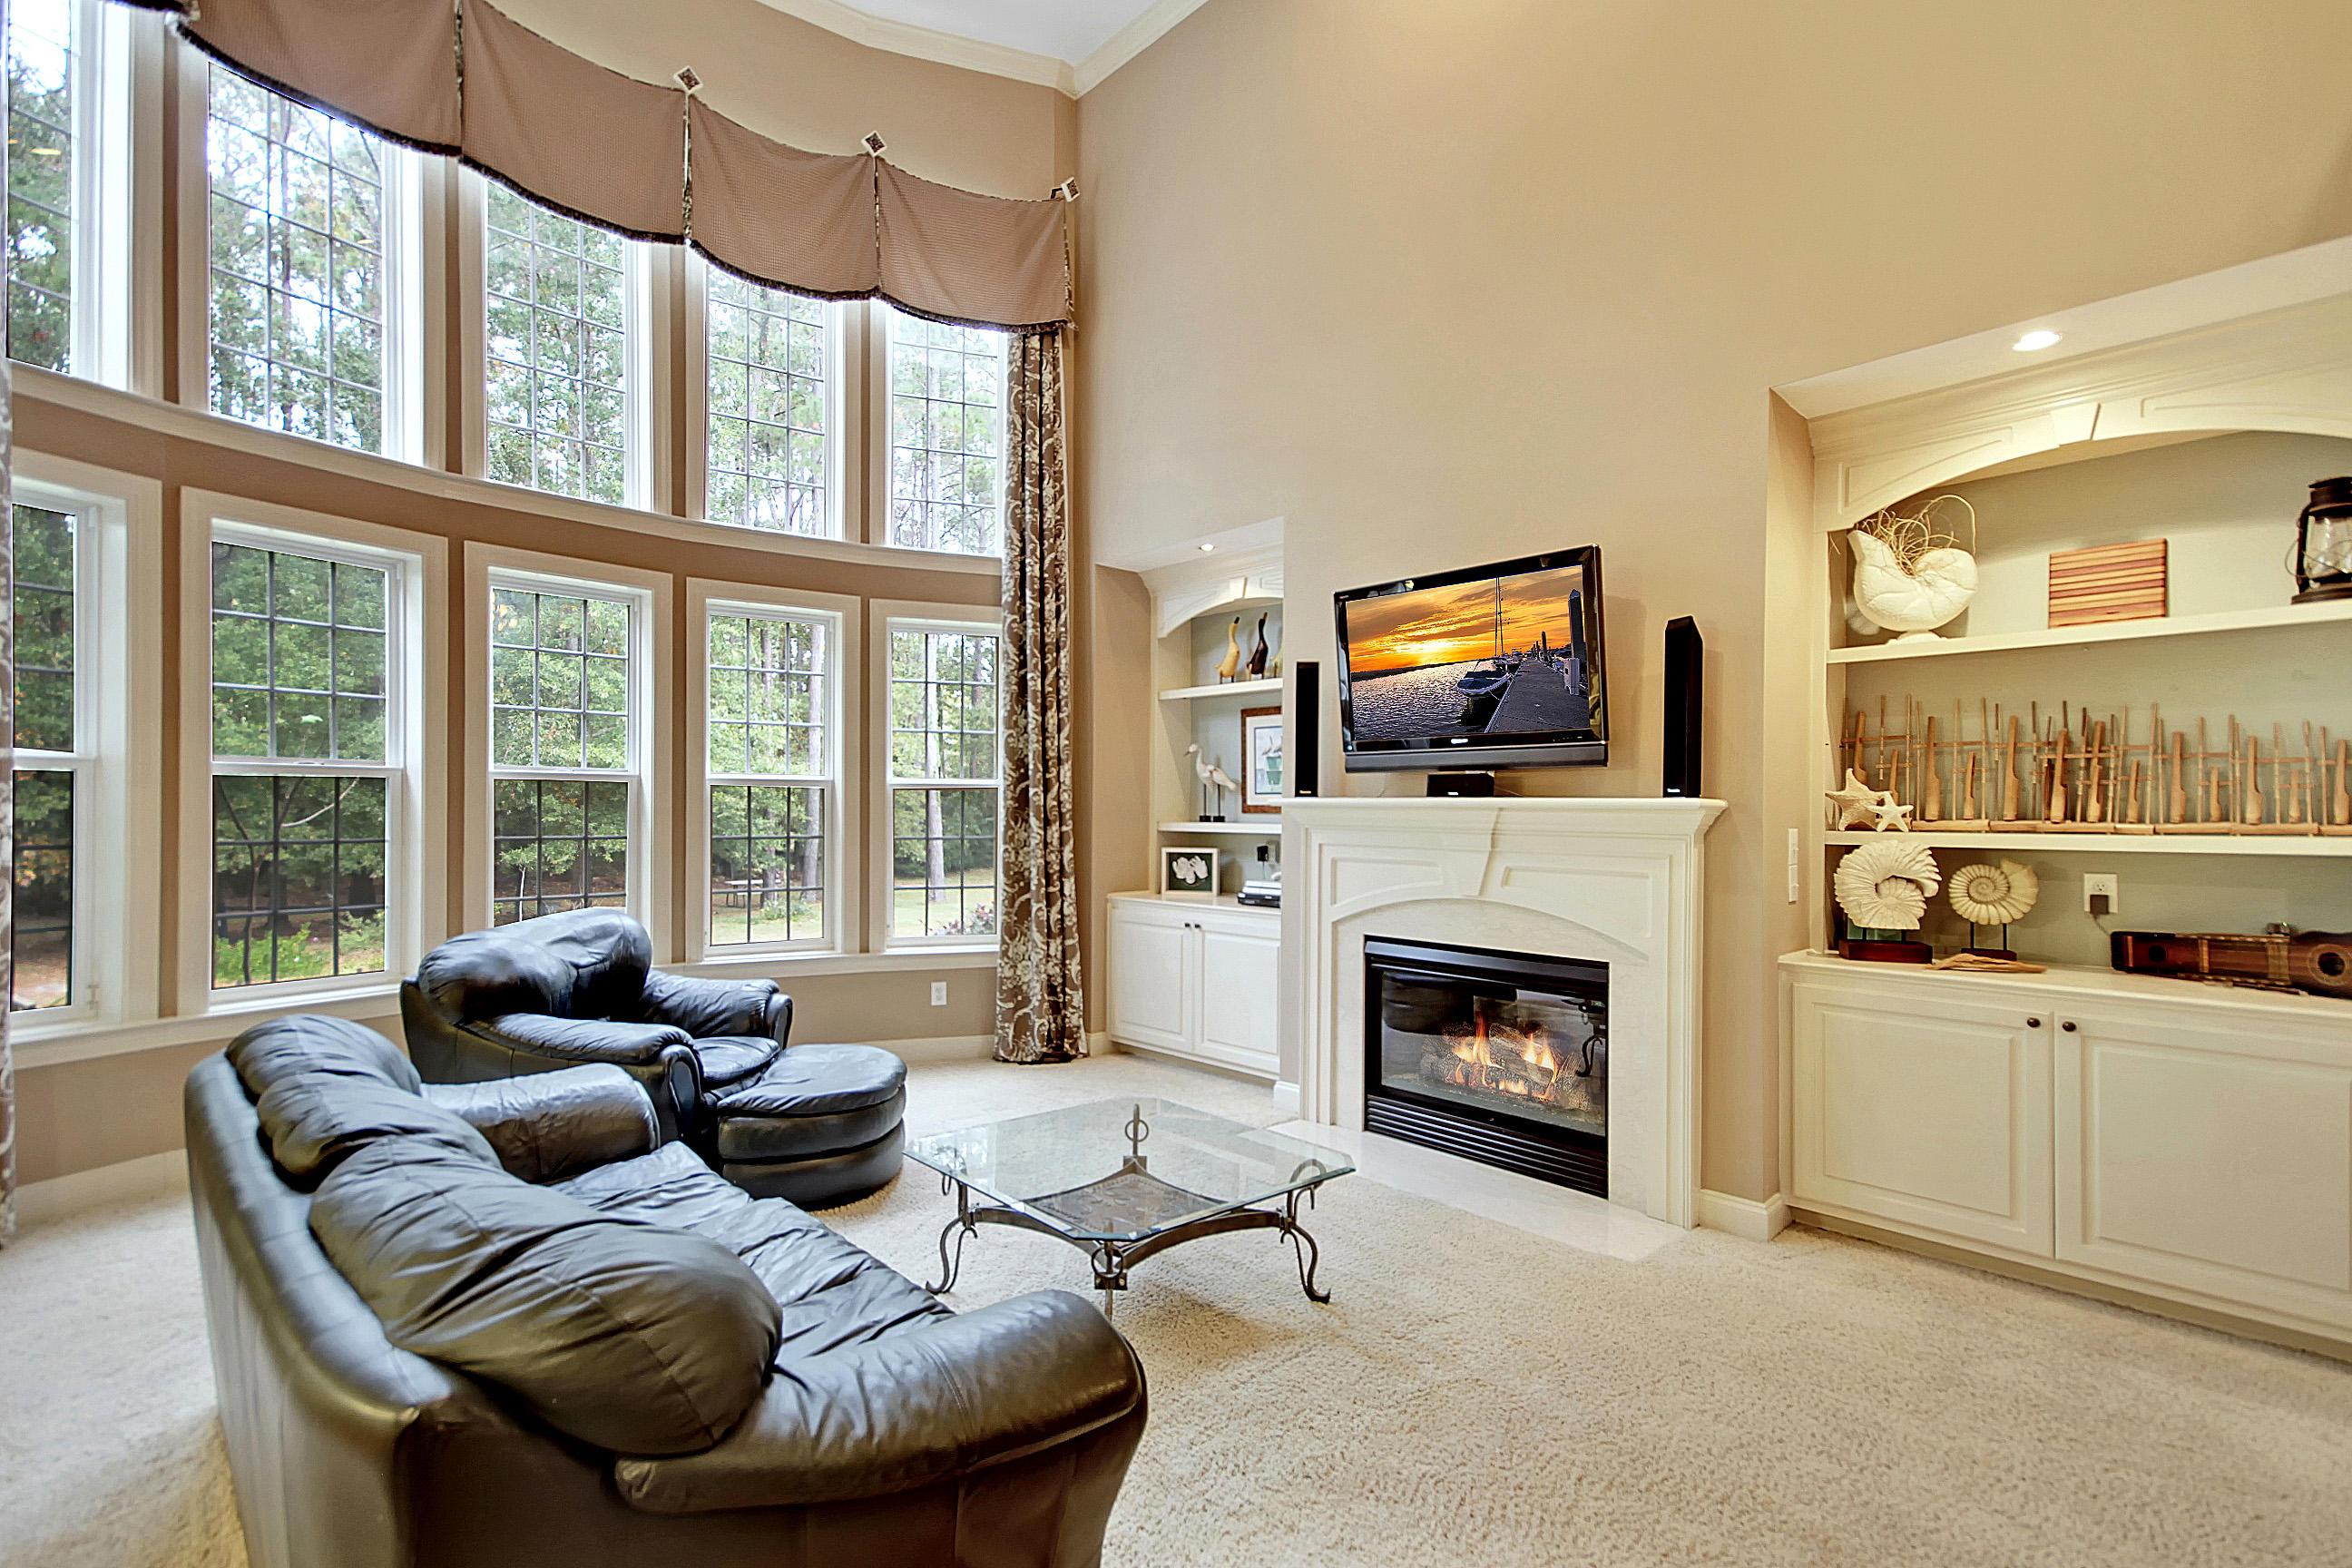 Dunes West Homes For Sale - 2449 Darts Cove, Mount Pleasant, SC - 51